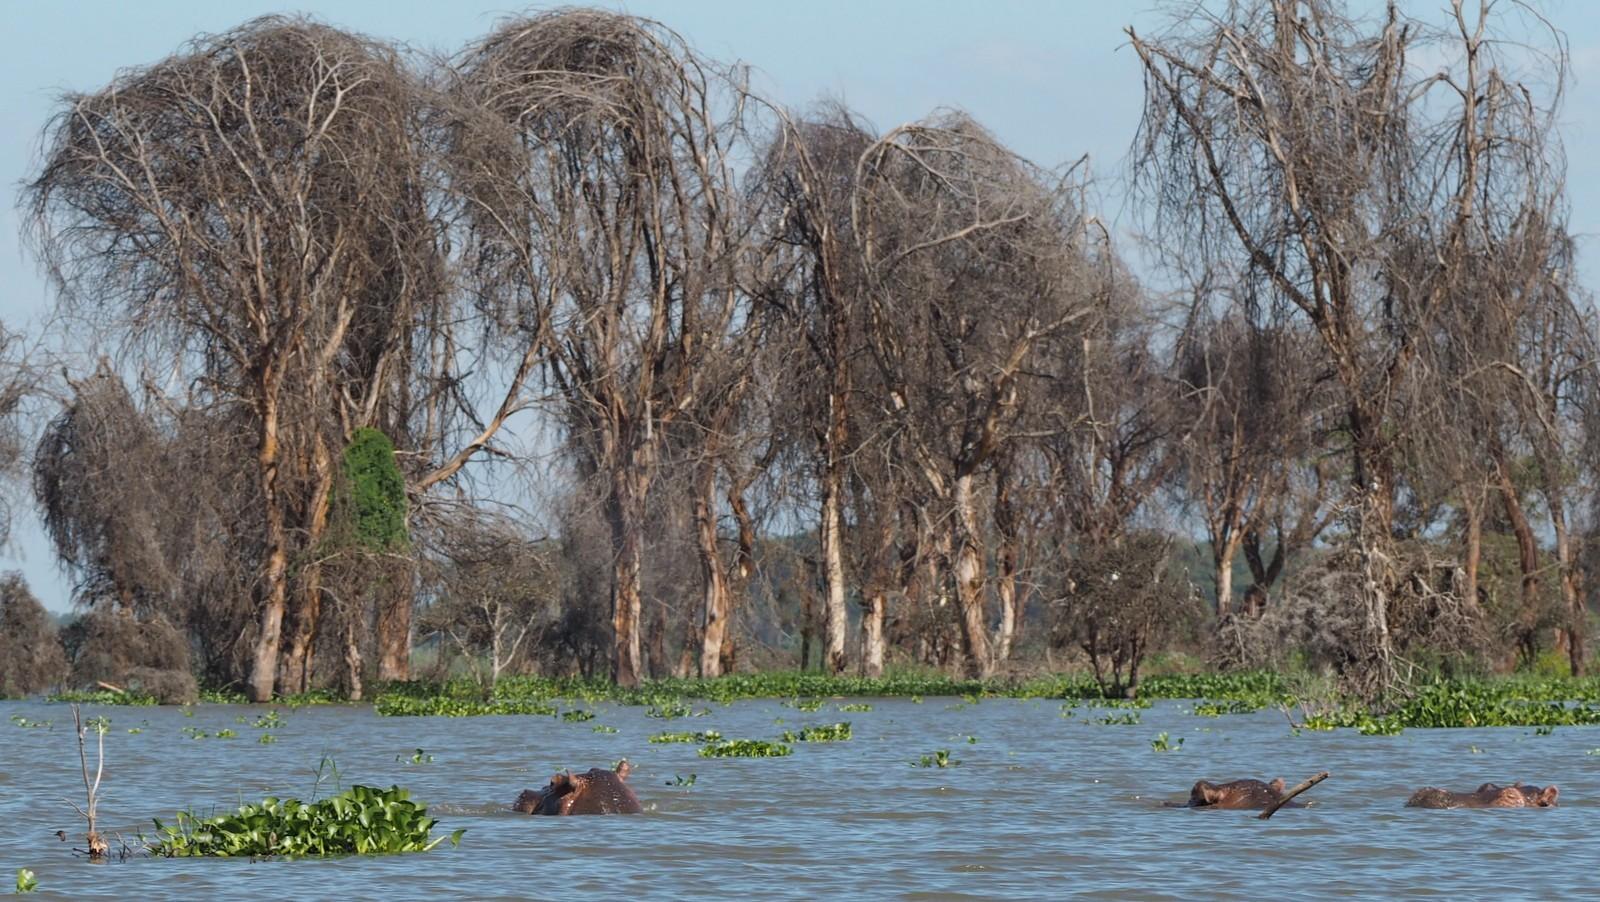 Hippos Naivasha